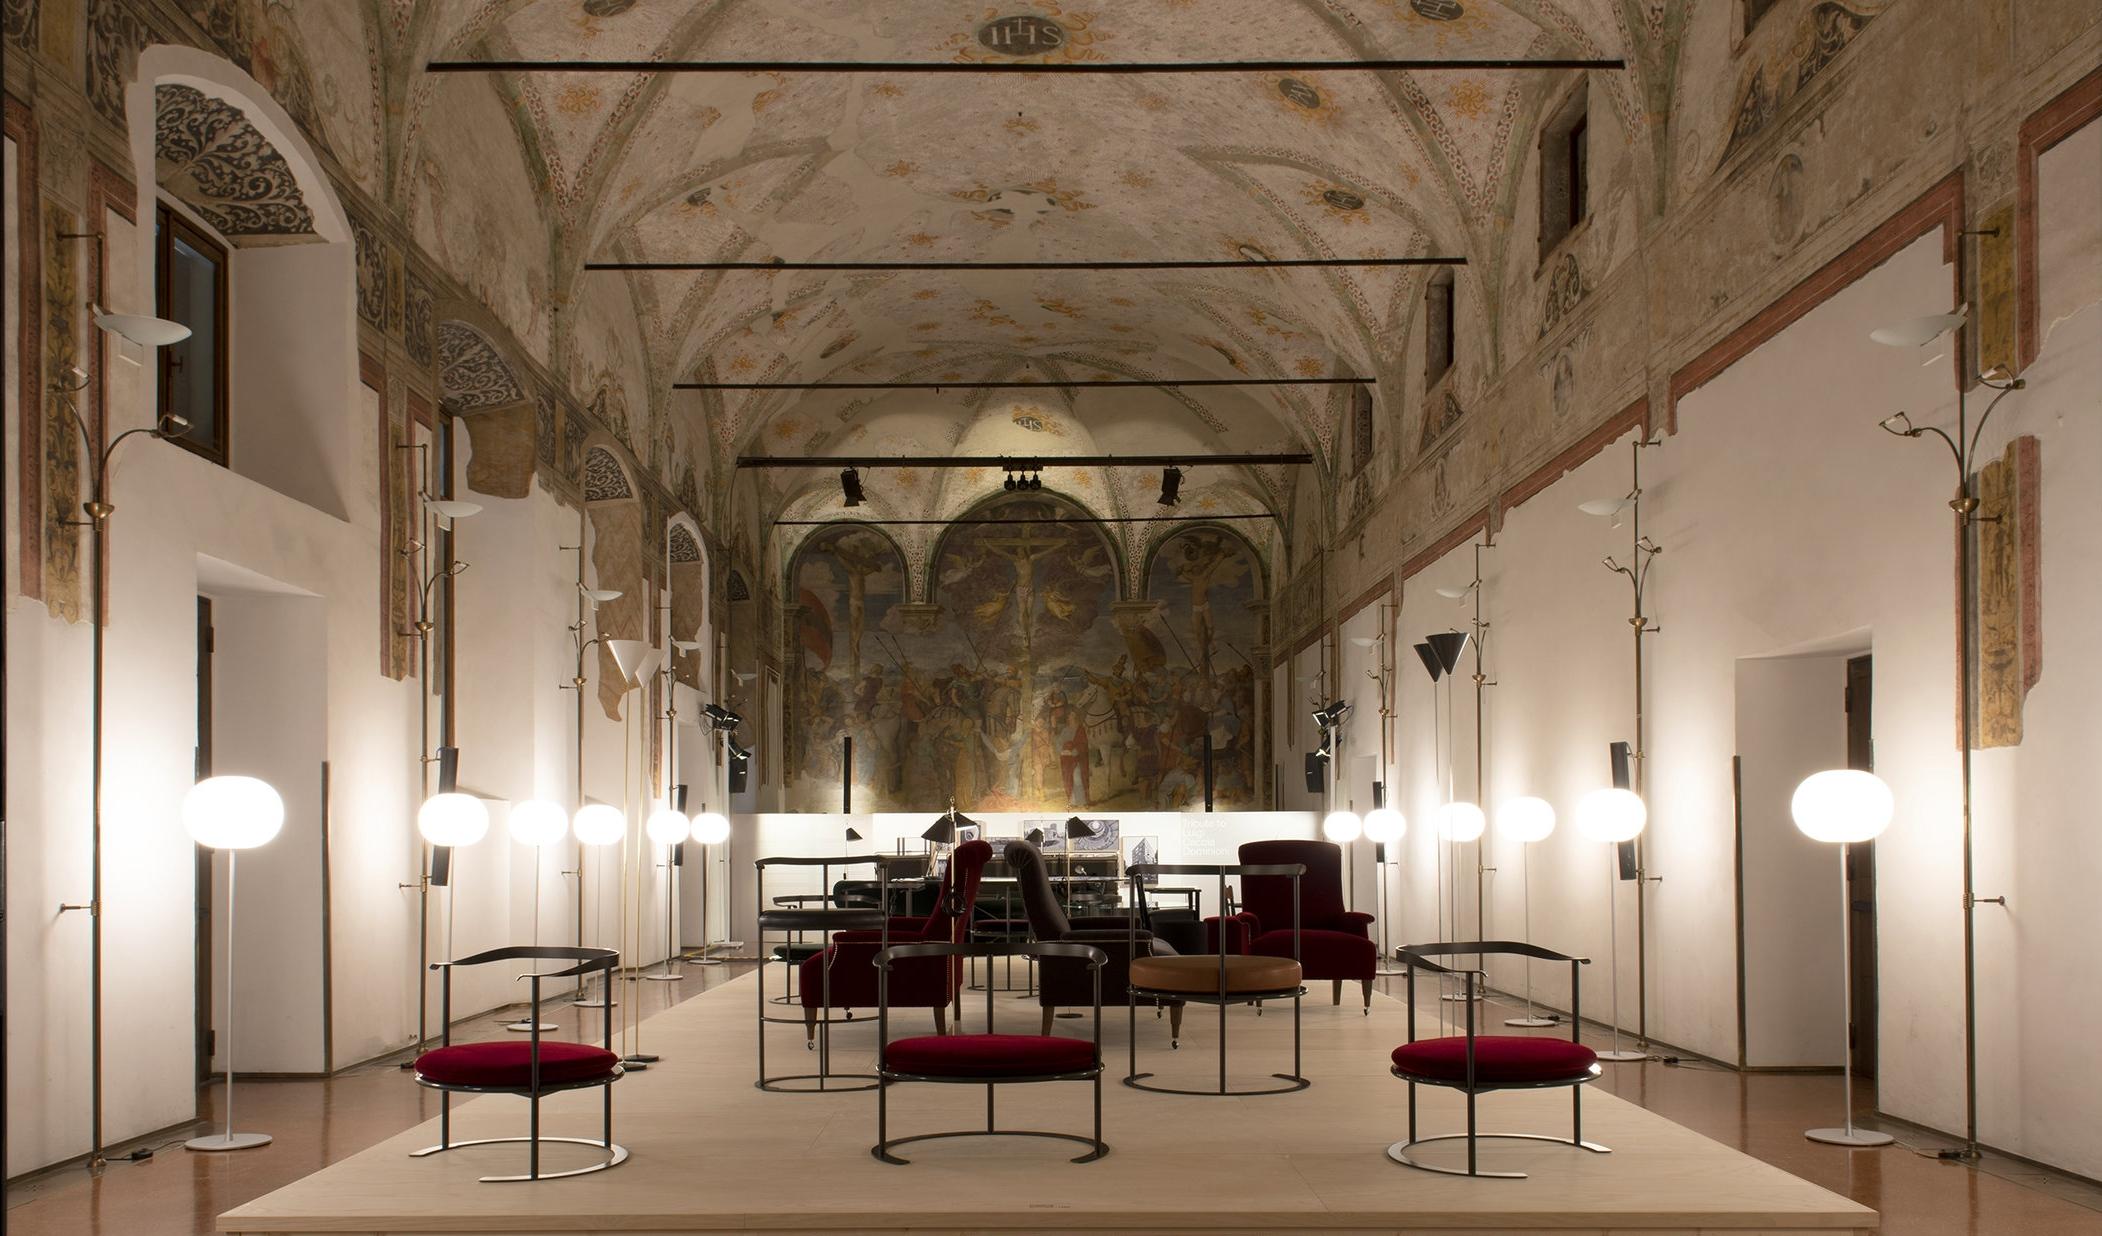 B&B Italia presented a collection of Luigi Caccia Dominioni's furniture inside the historic frescoed hall of the Umanitariain building.